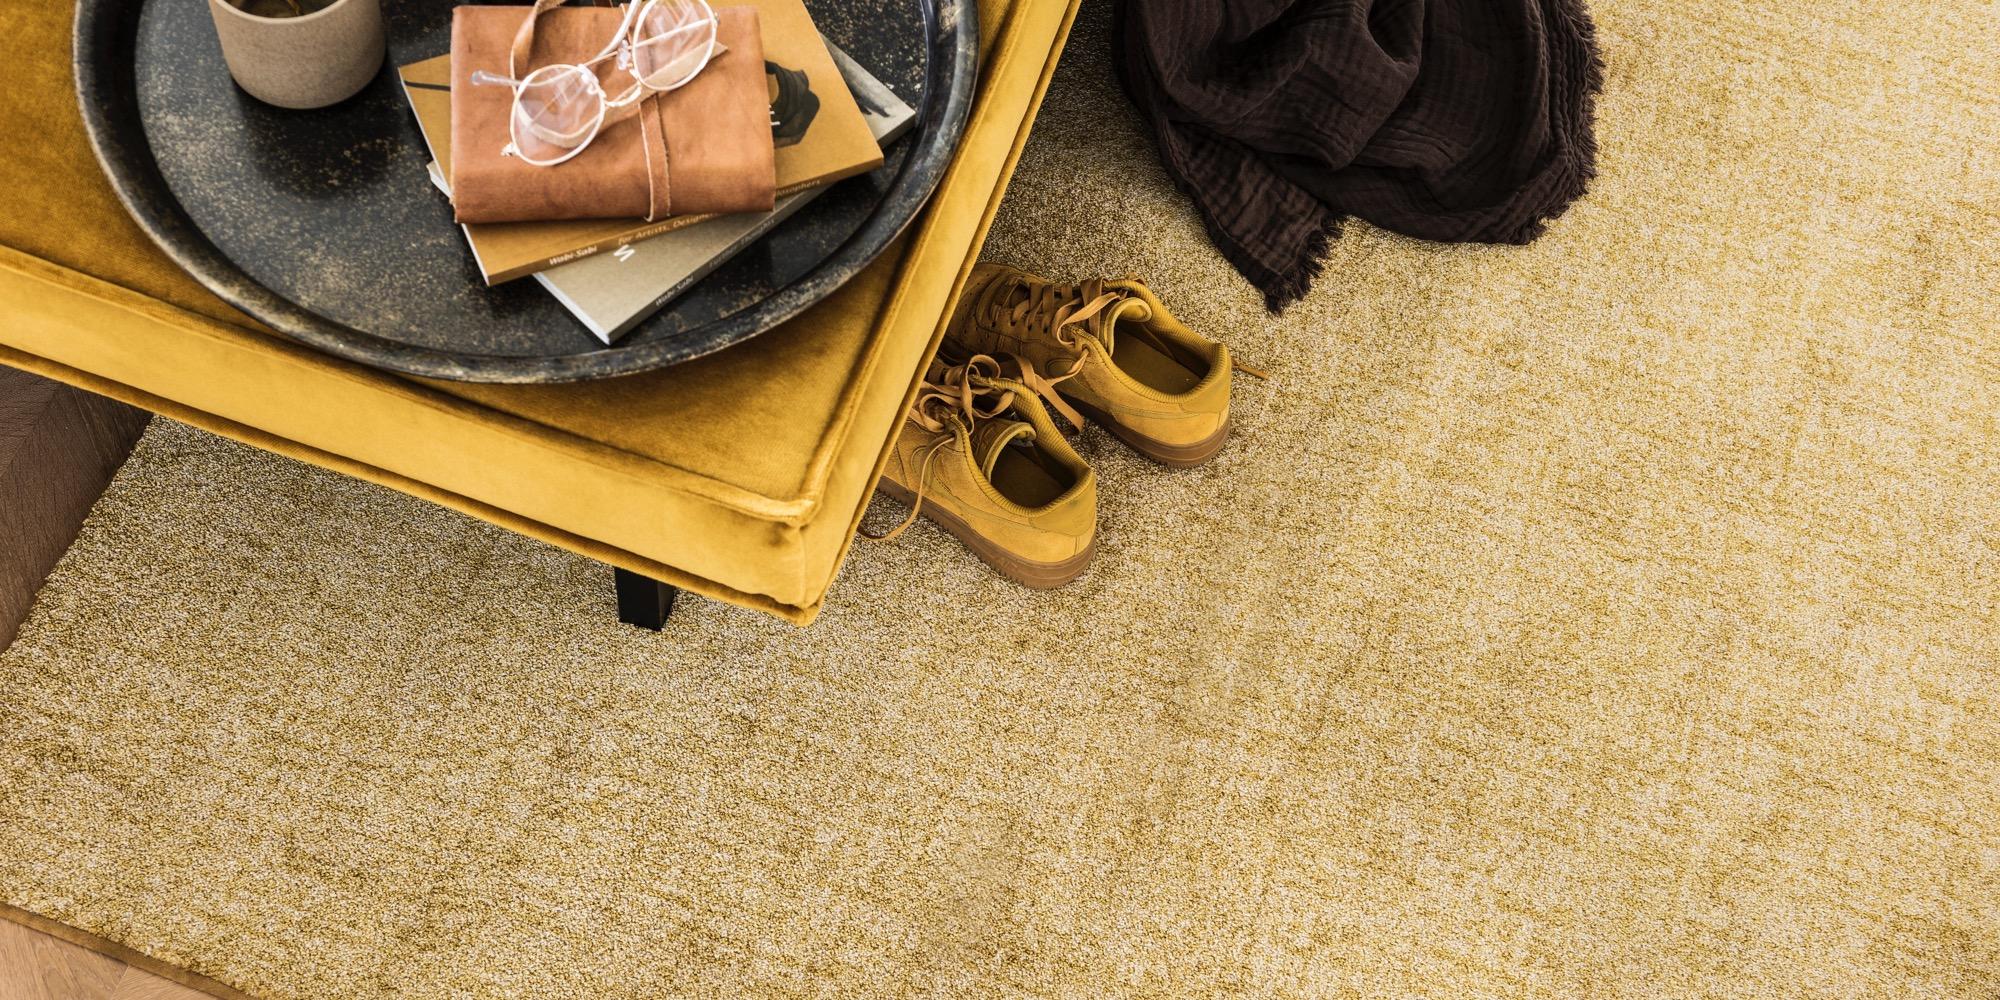 vtwonen-vloerkleed-houten-vloer